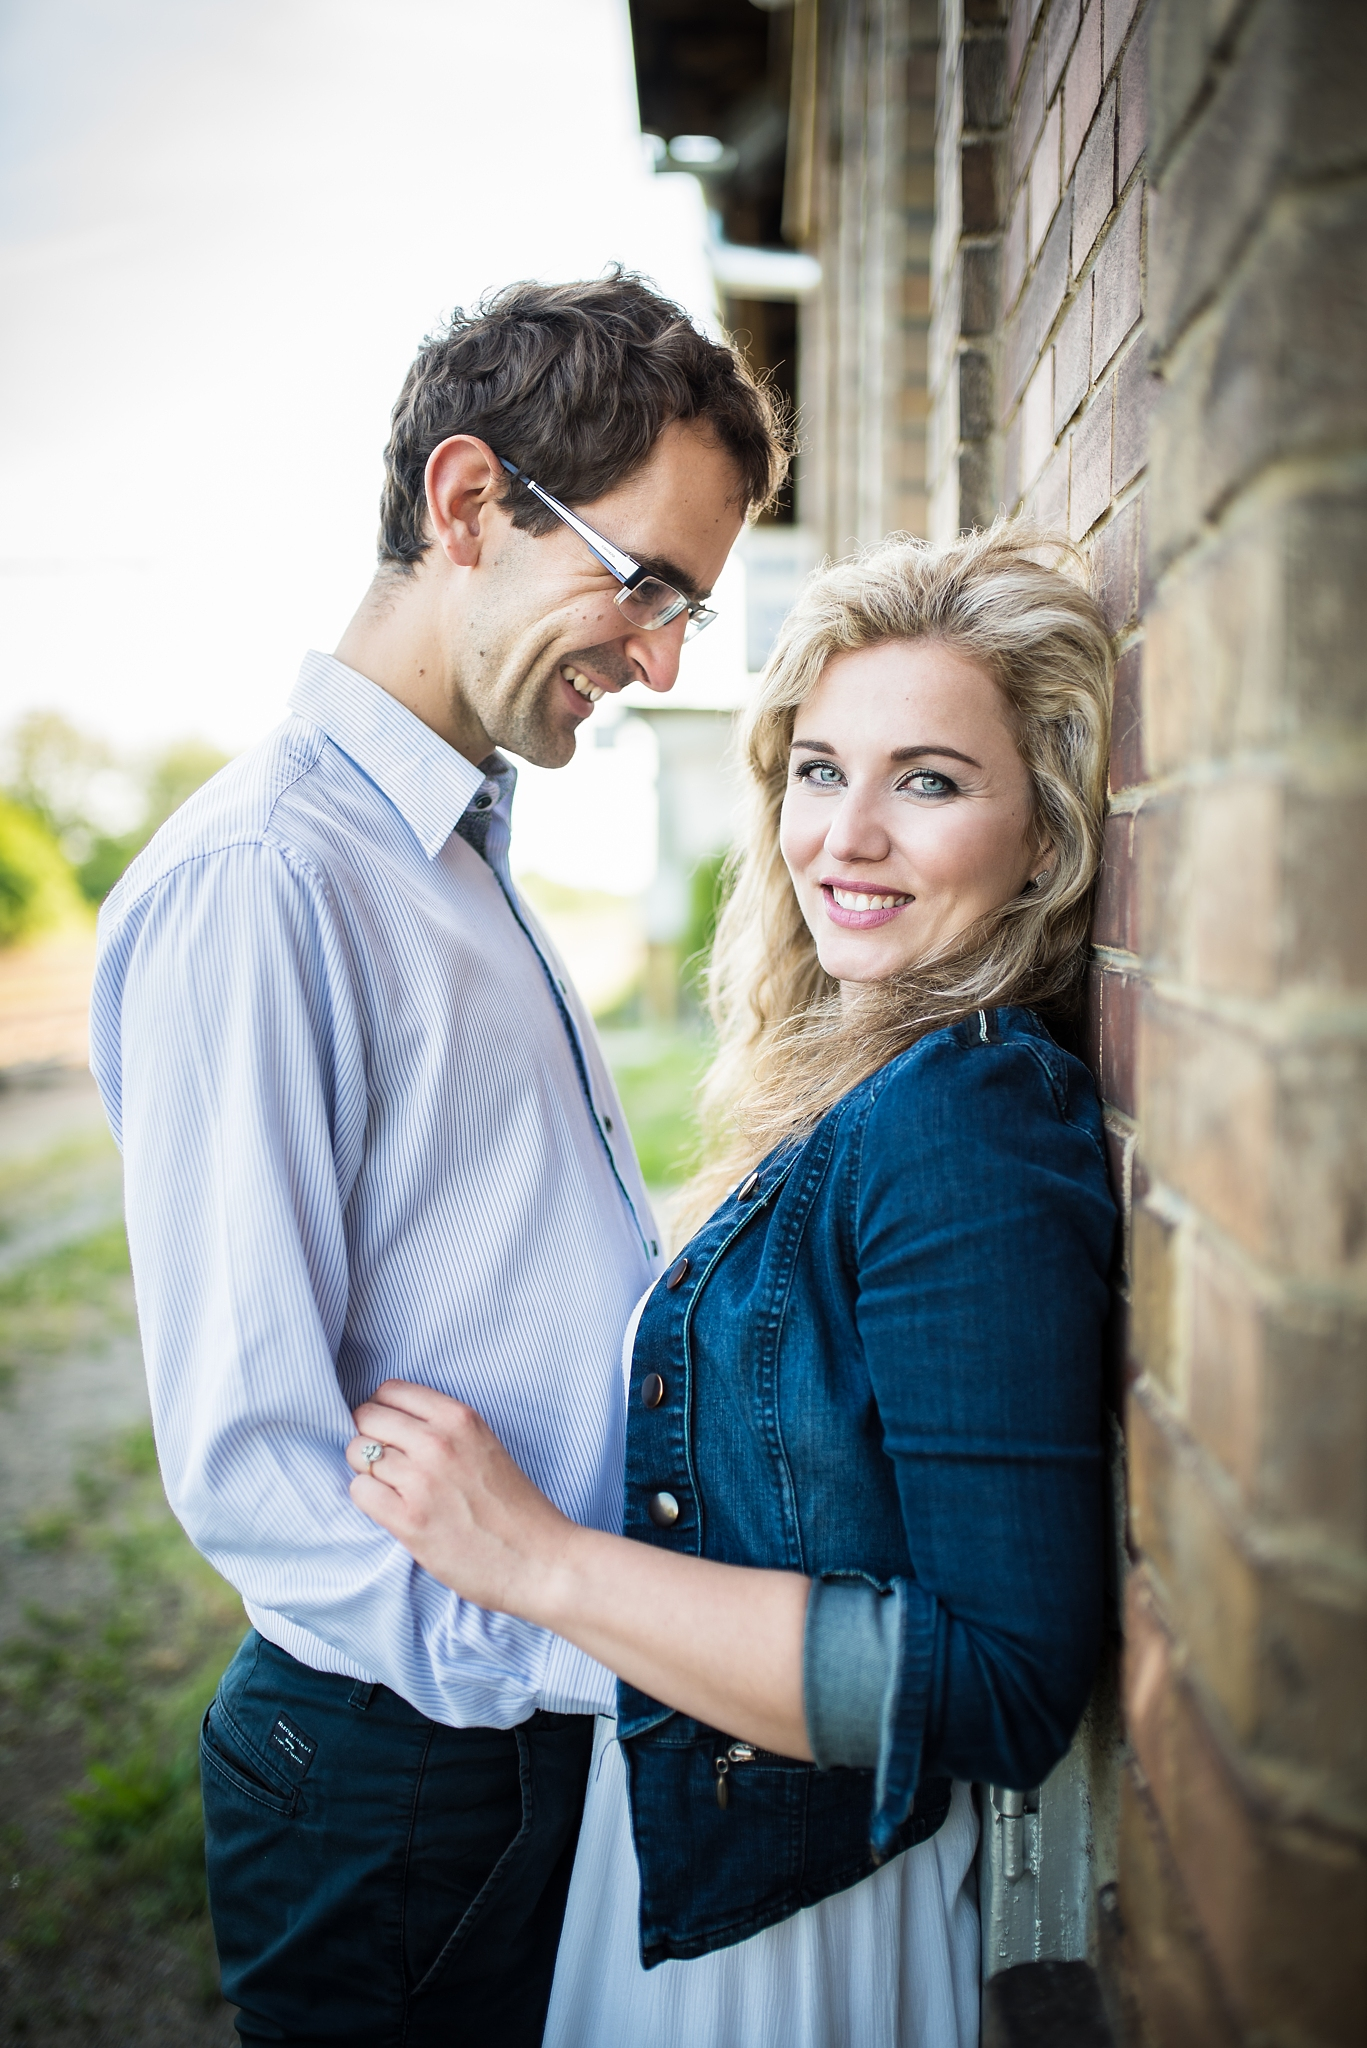 Paarfotografie: Nähe, harmonische Farben und Lächeln